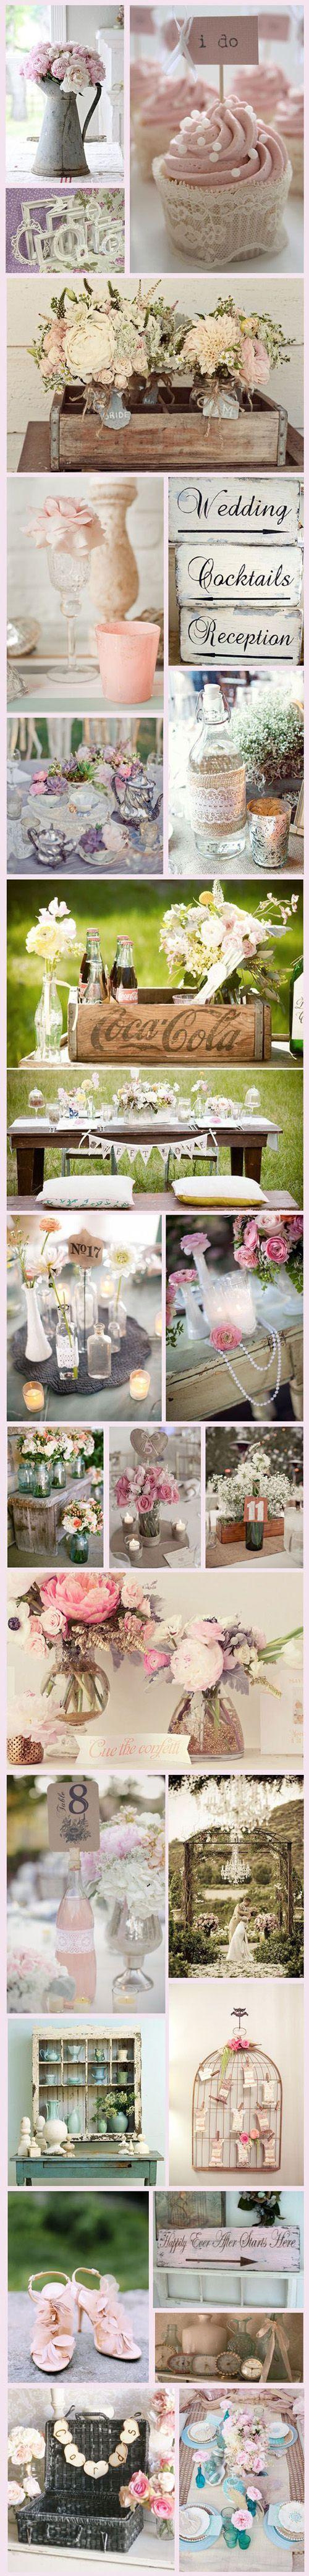 boho chic wedding idea 4